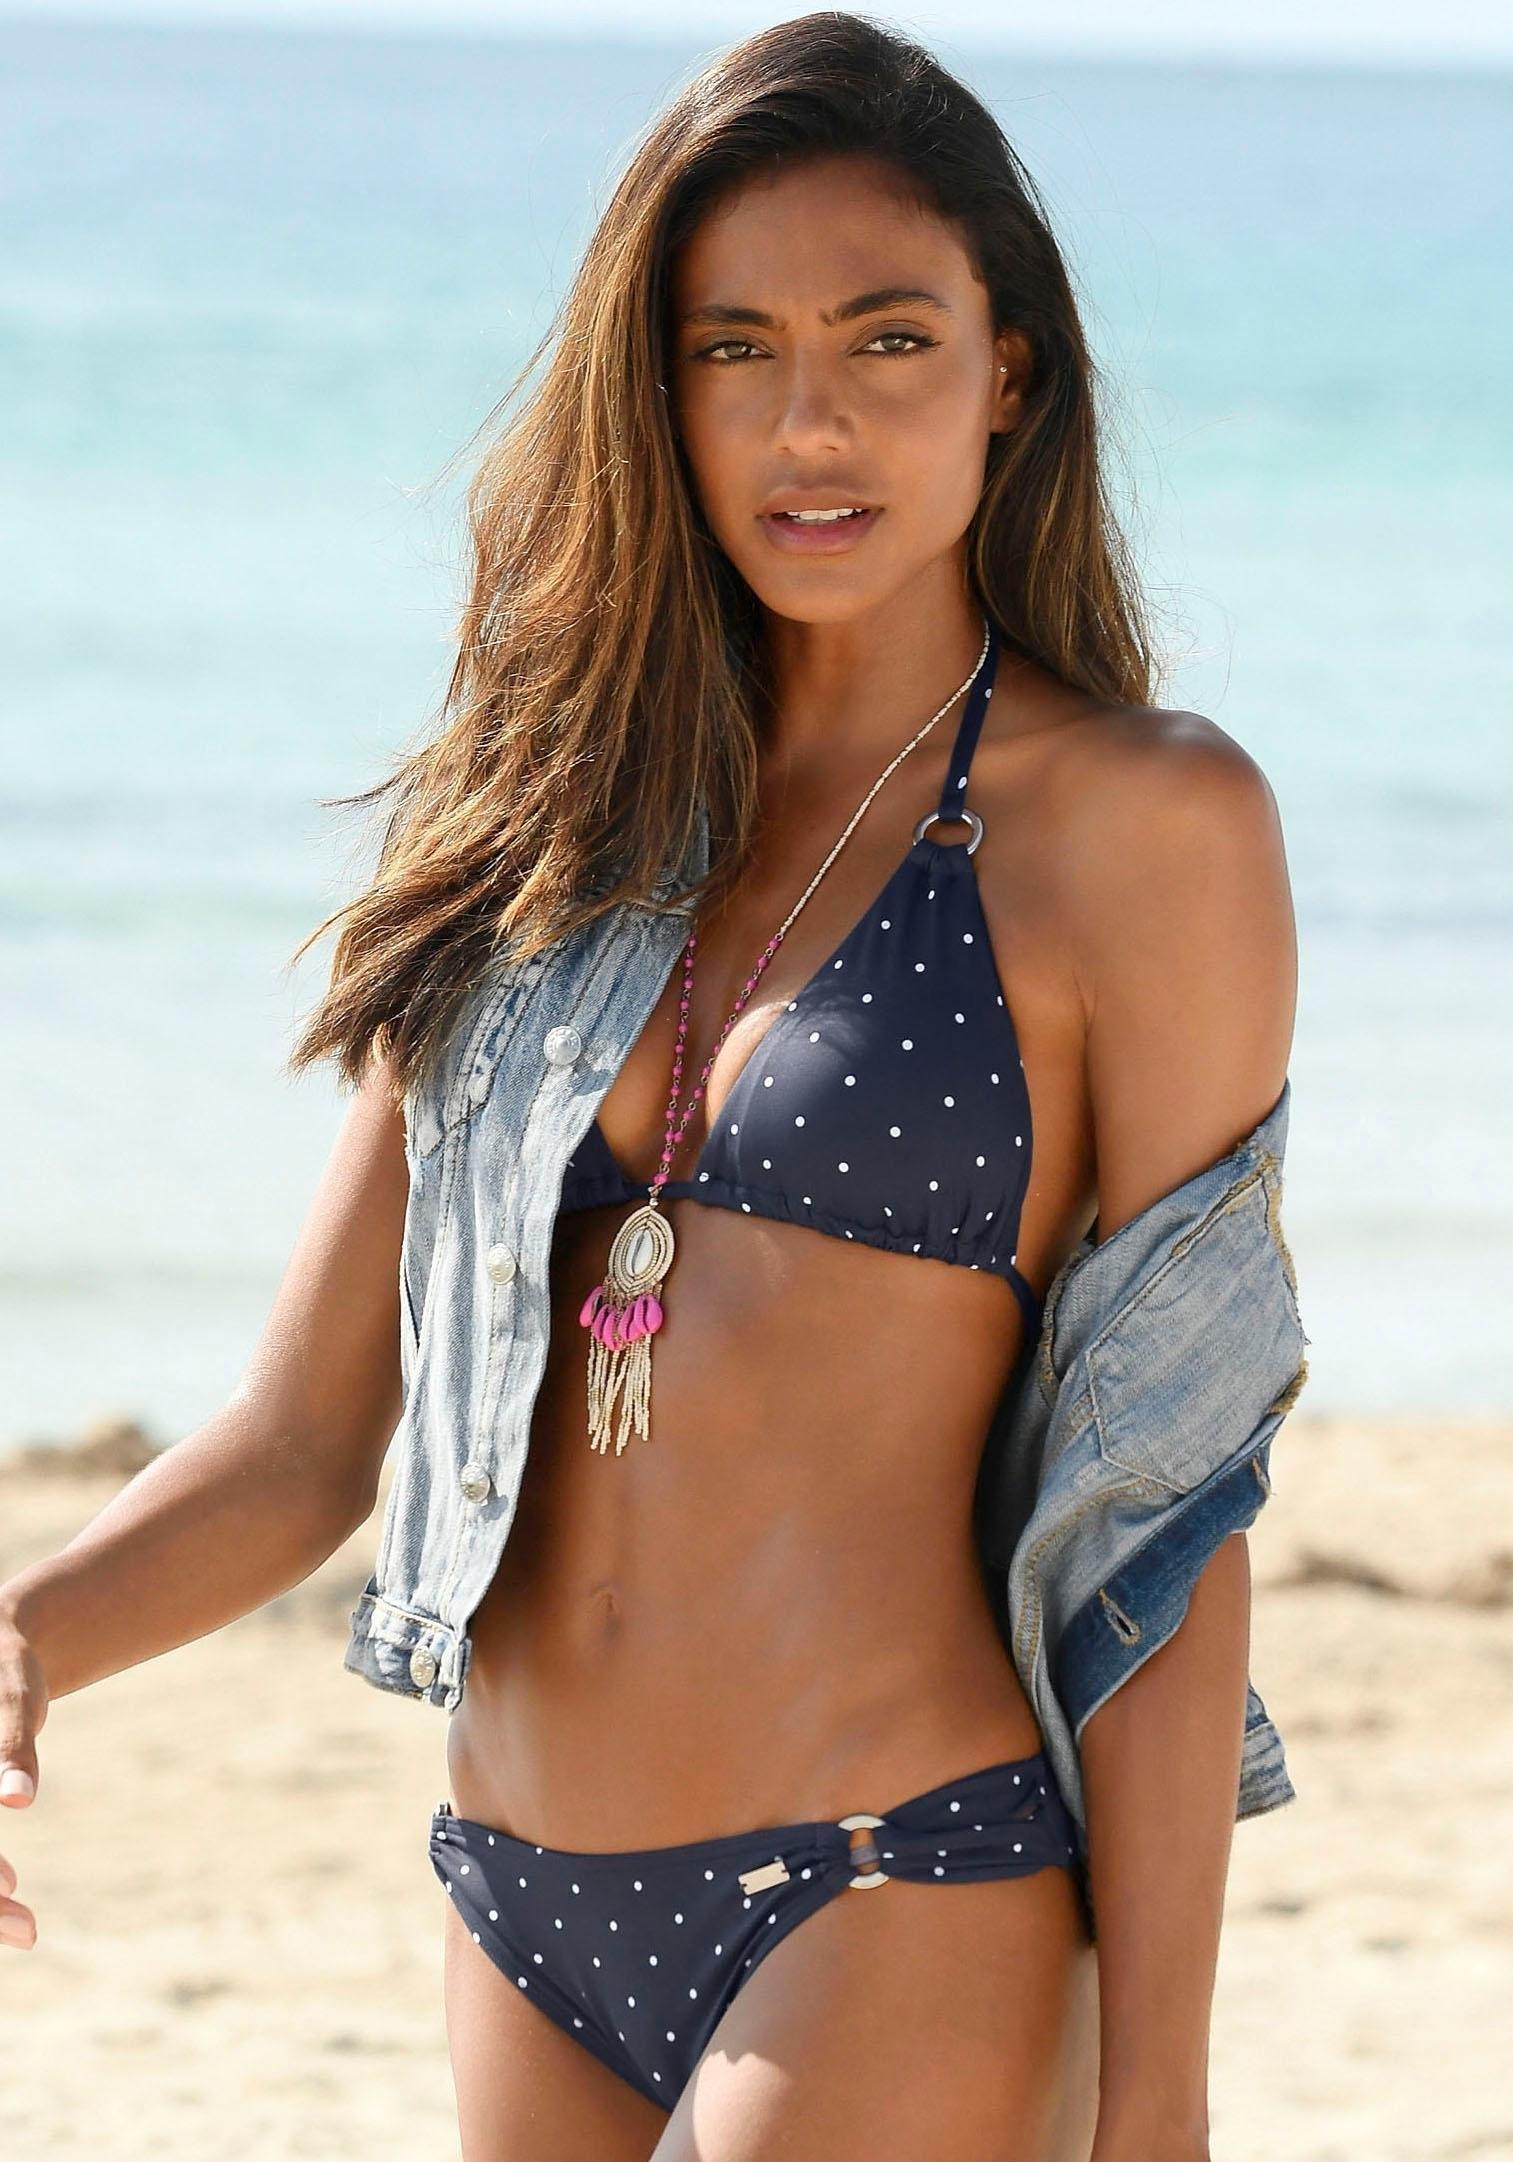 Lascana triangel-bikinitop Sparkel met goudkleurige ringen online kopen op otto.nl